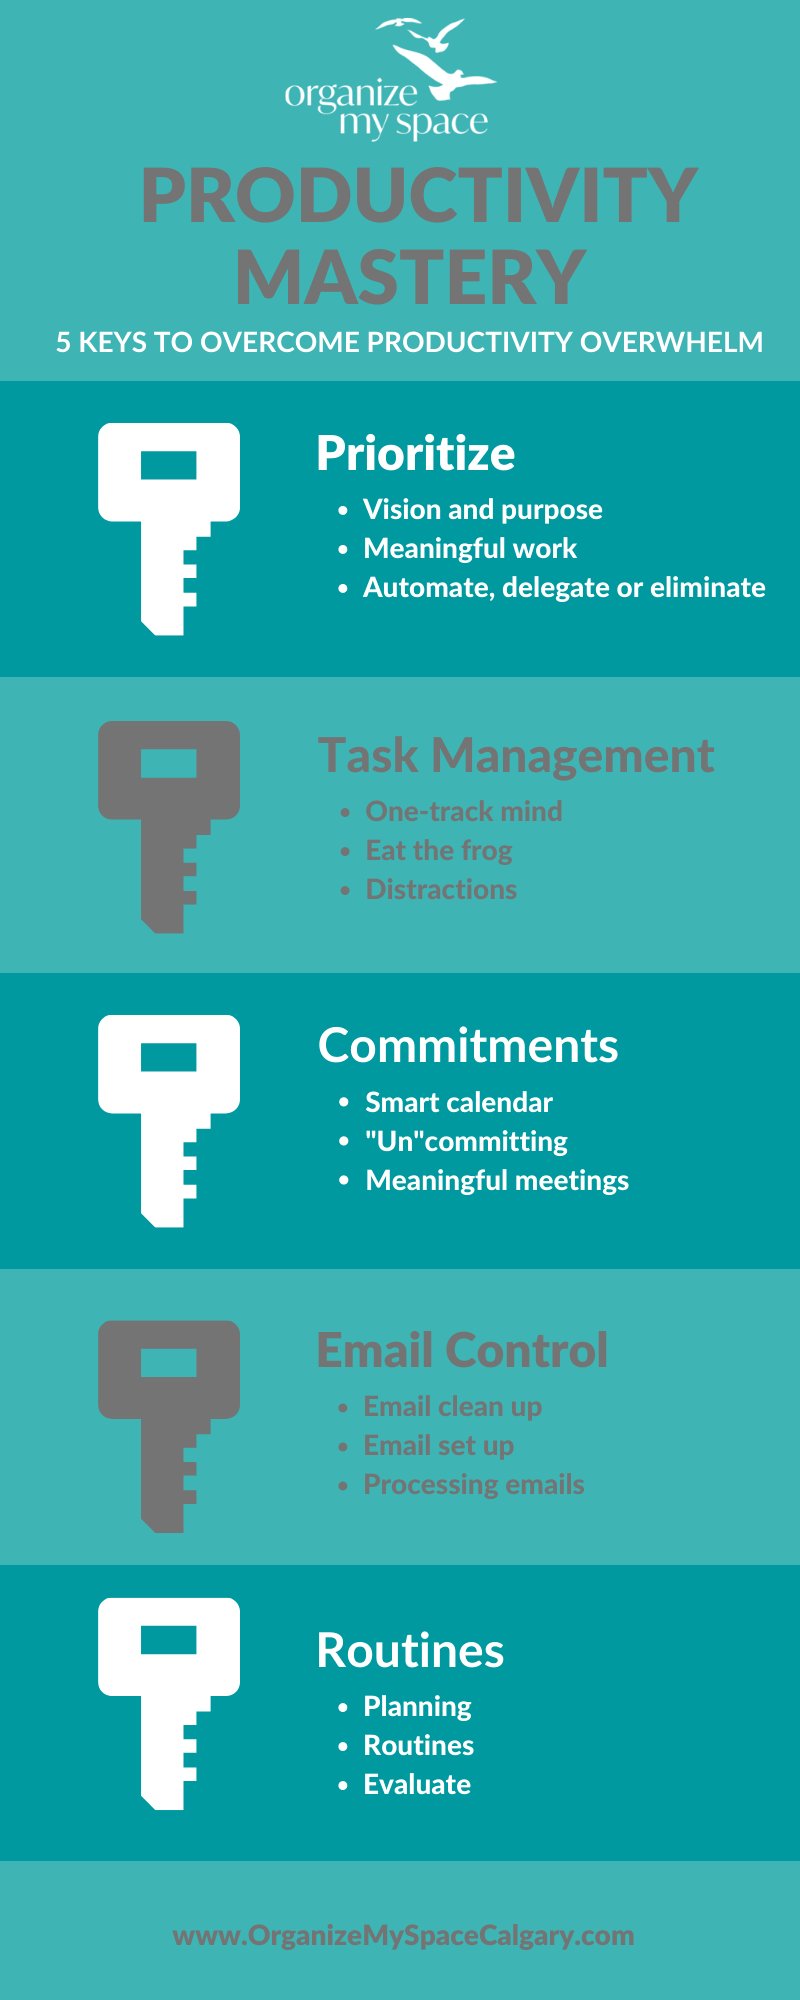 5 Keys to Overcome Productivity Overwhelm